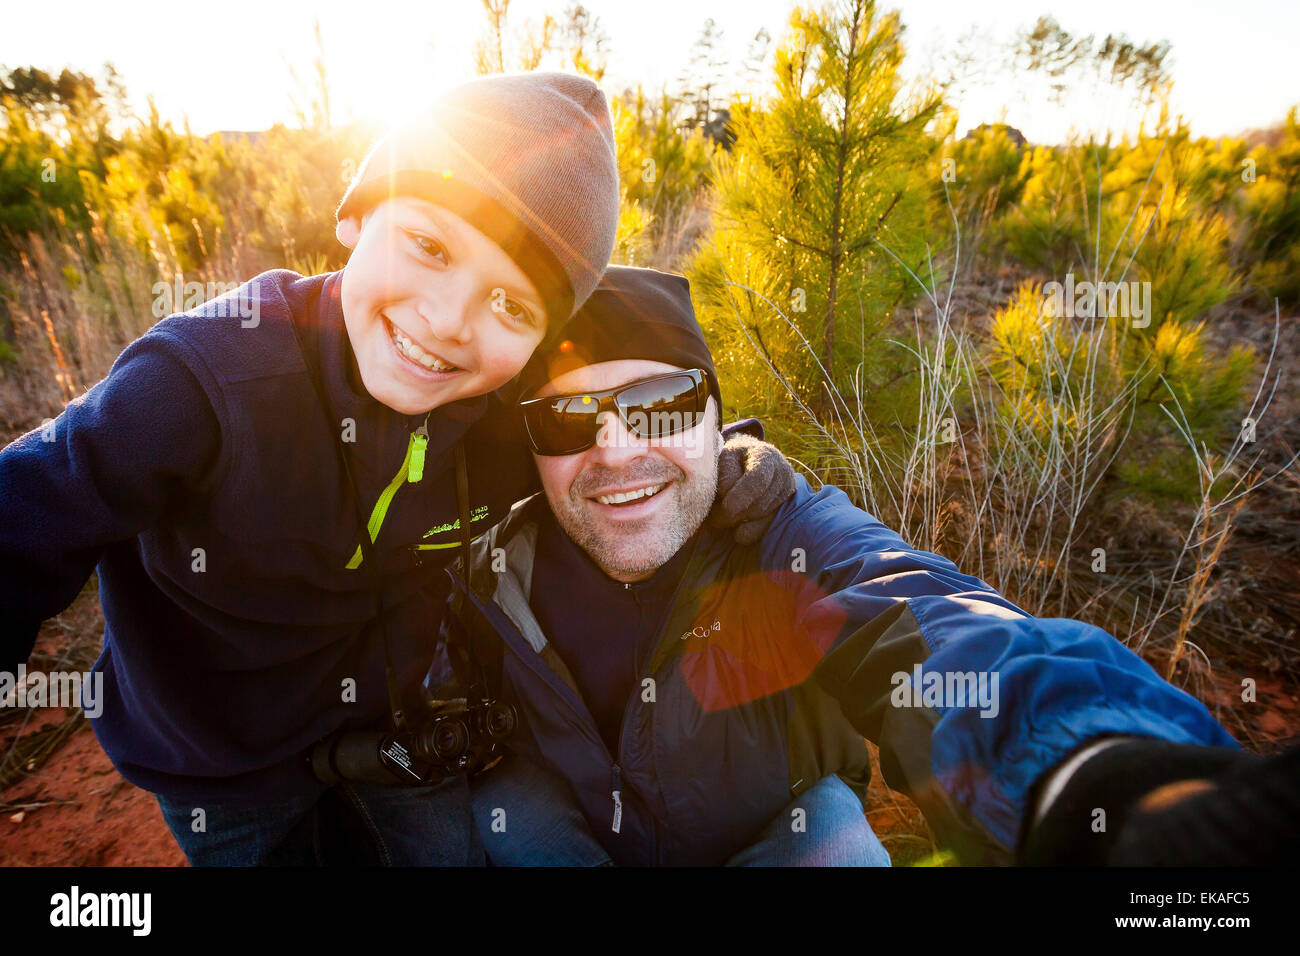 Vater und Sohn nehmen ein Selbstporträt Stockbild